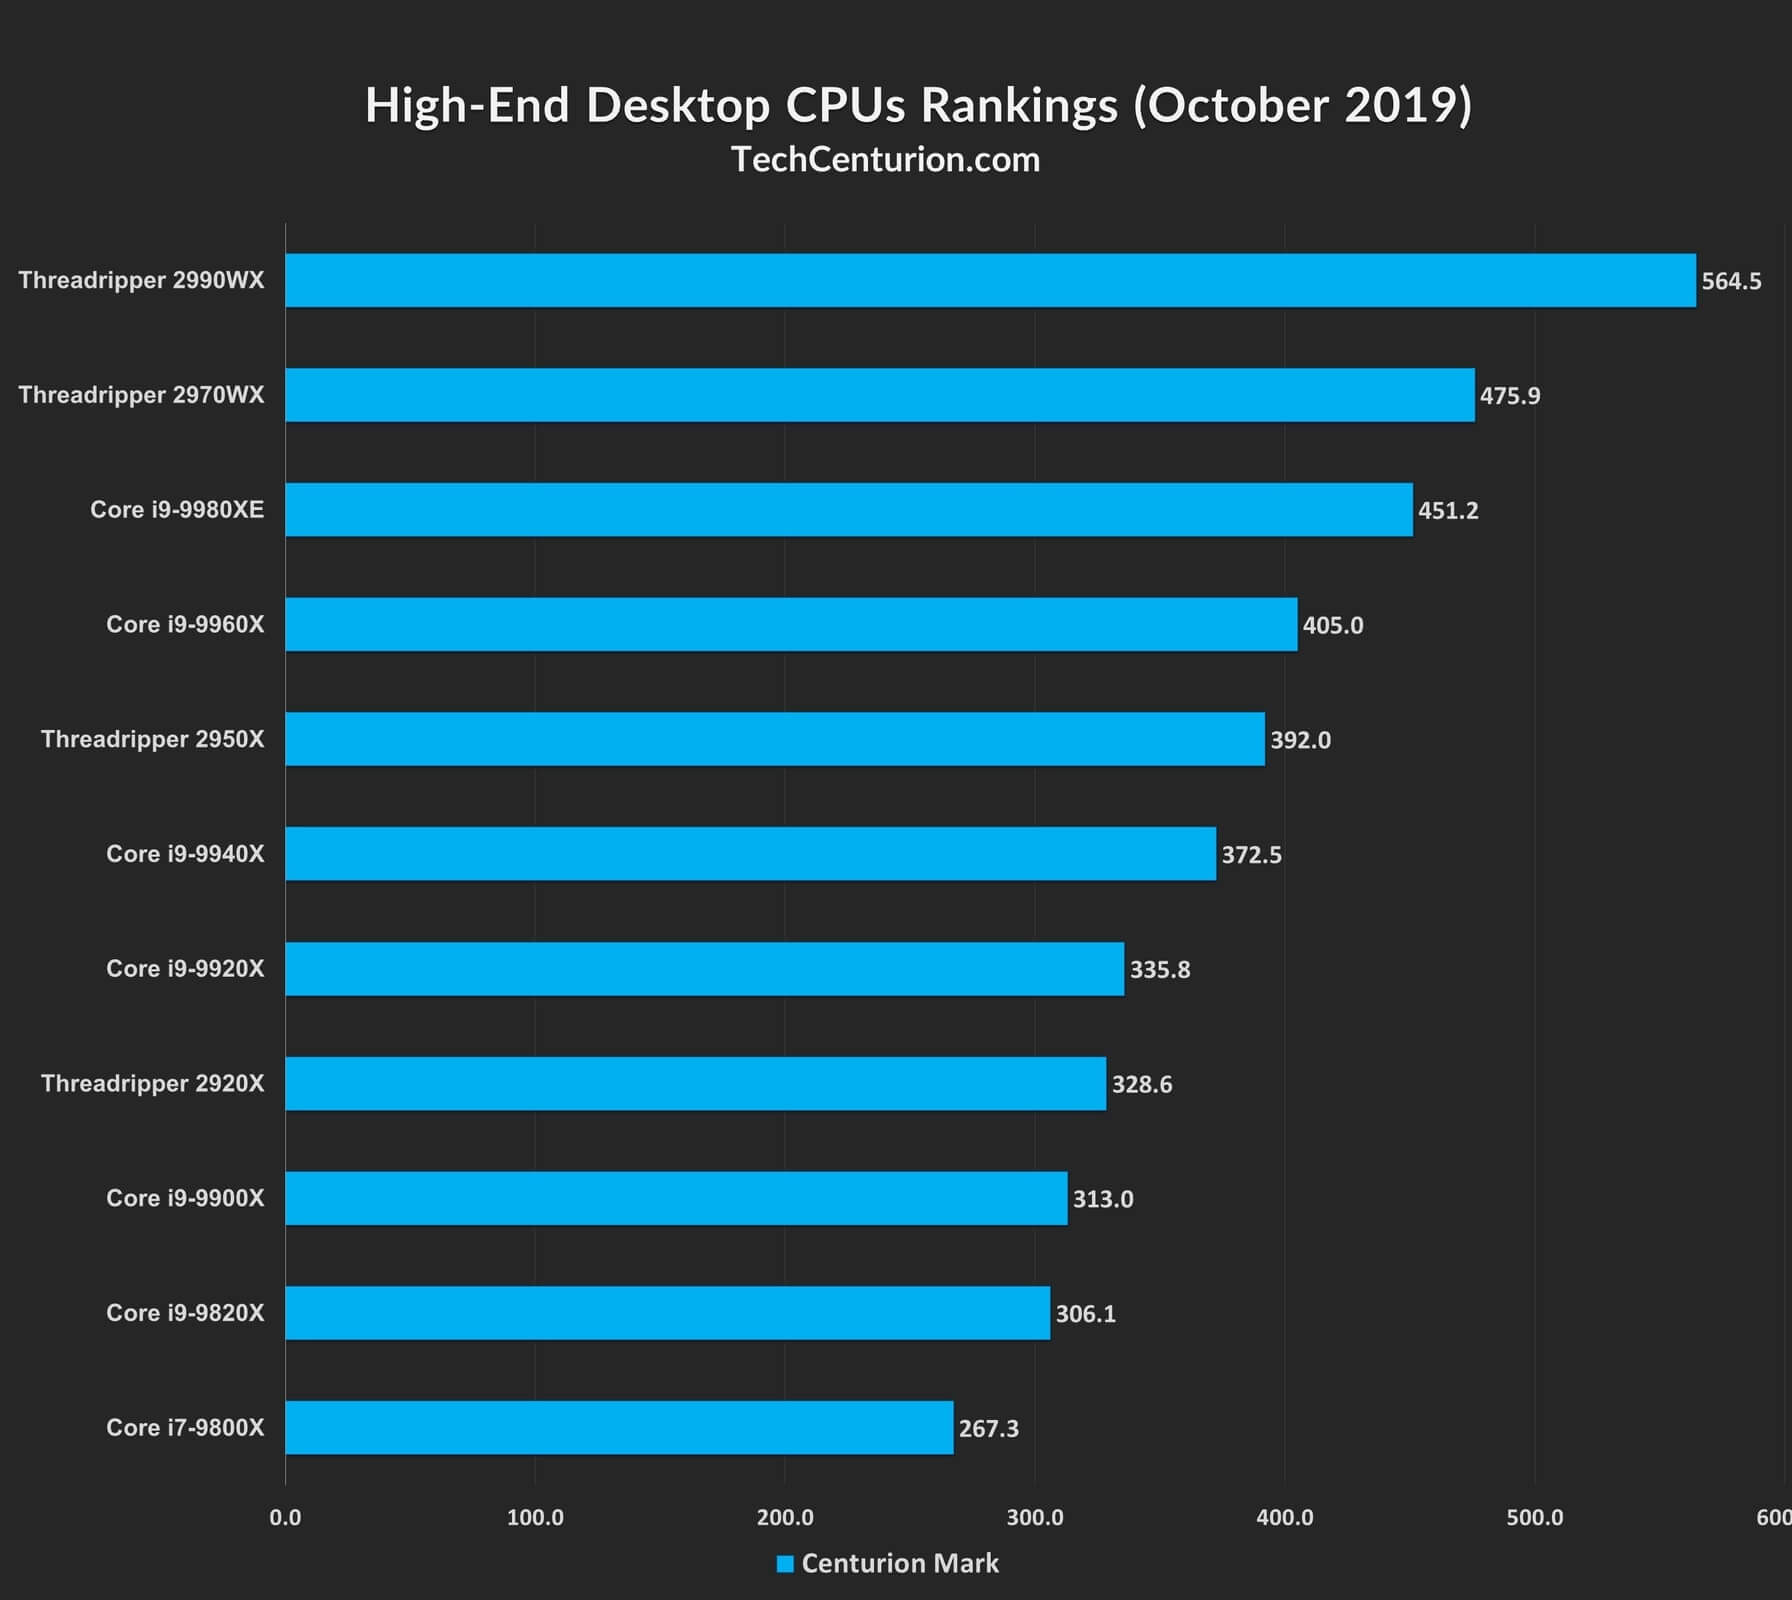 High-End Desktop (HEDT) CPU Rankings